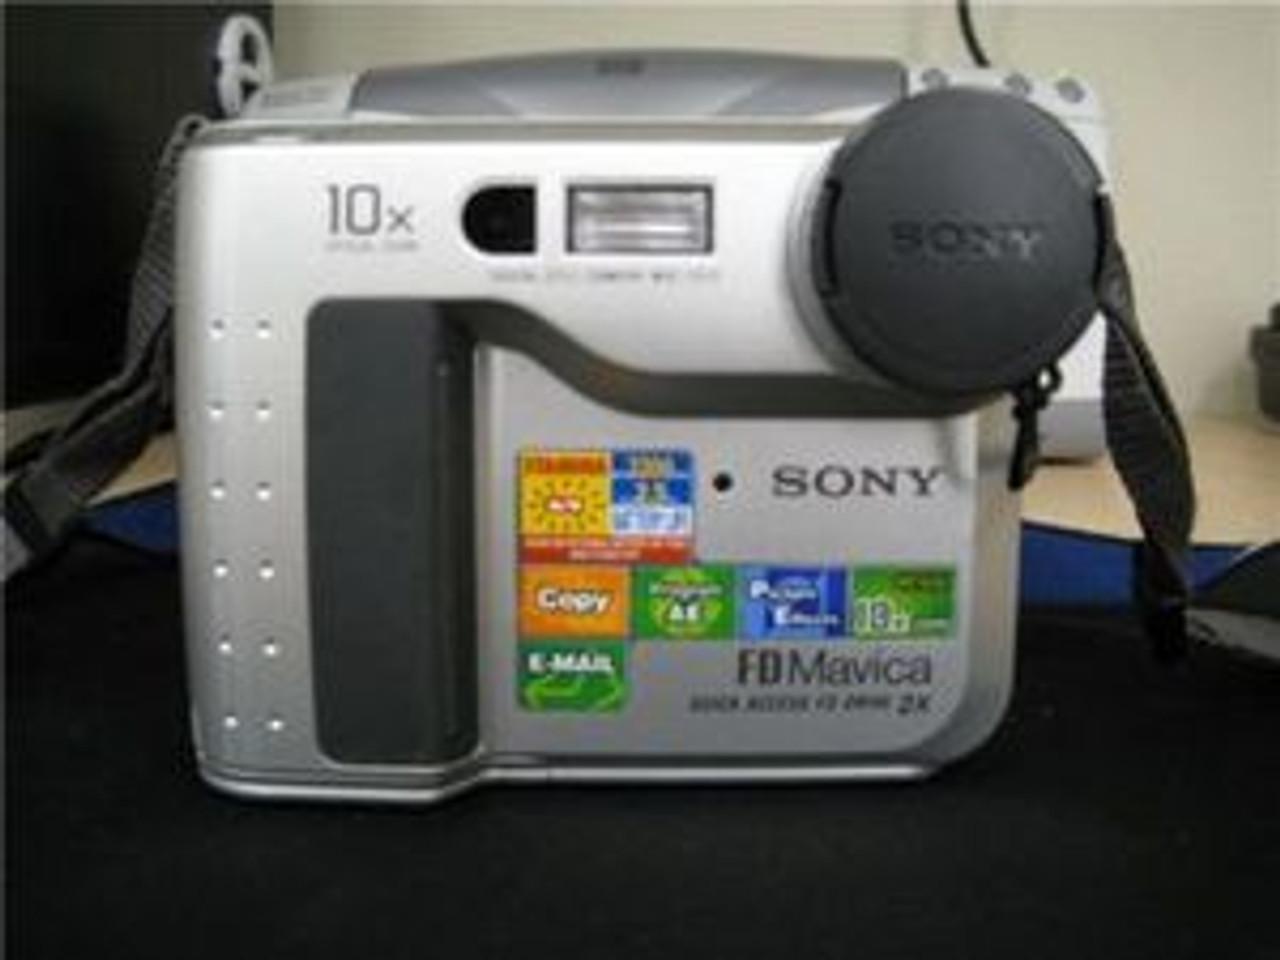 sony mavica camera mvc fd75 porter electronics rh porterelectronics com Mavica Digital Camera sony mavica mvc fd75 manual